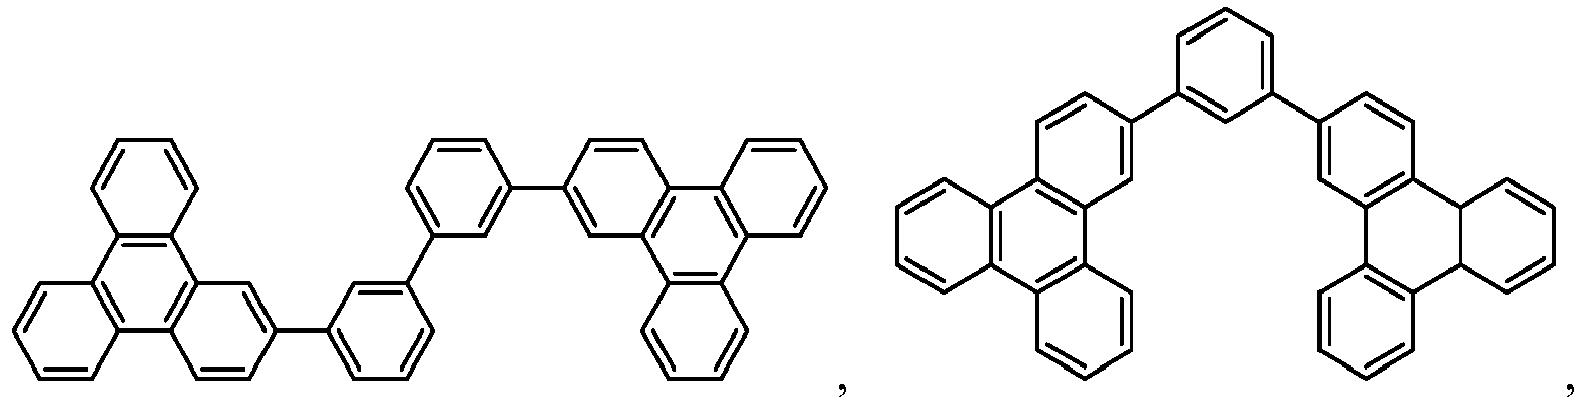 Figure imgb0880